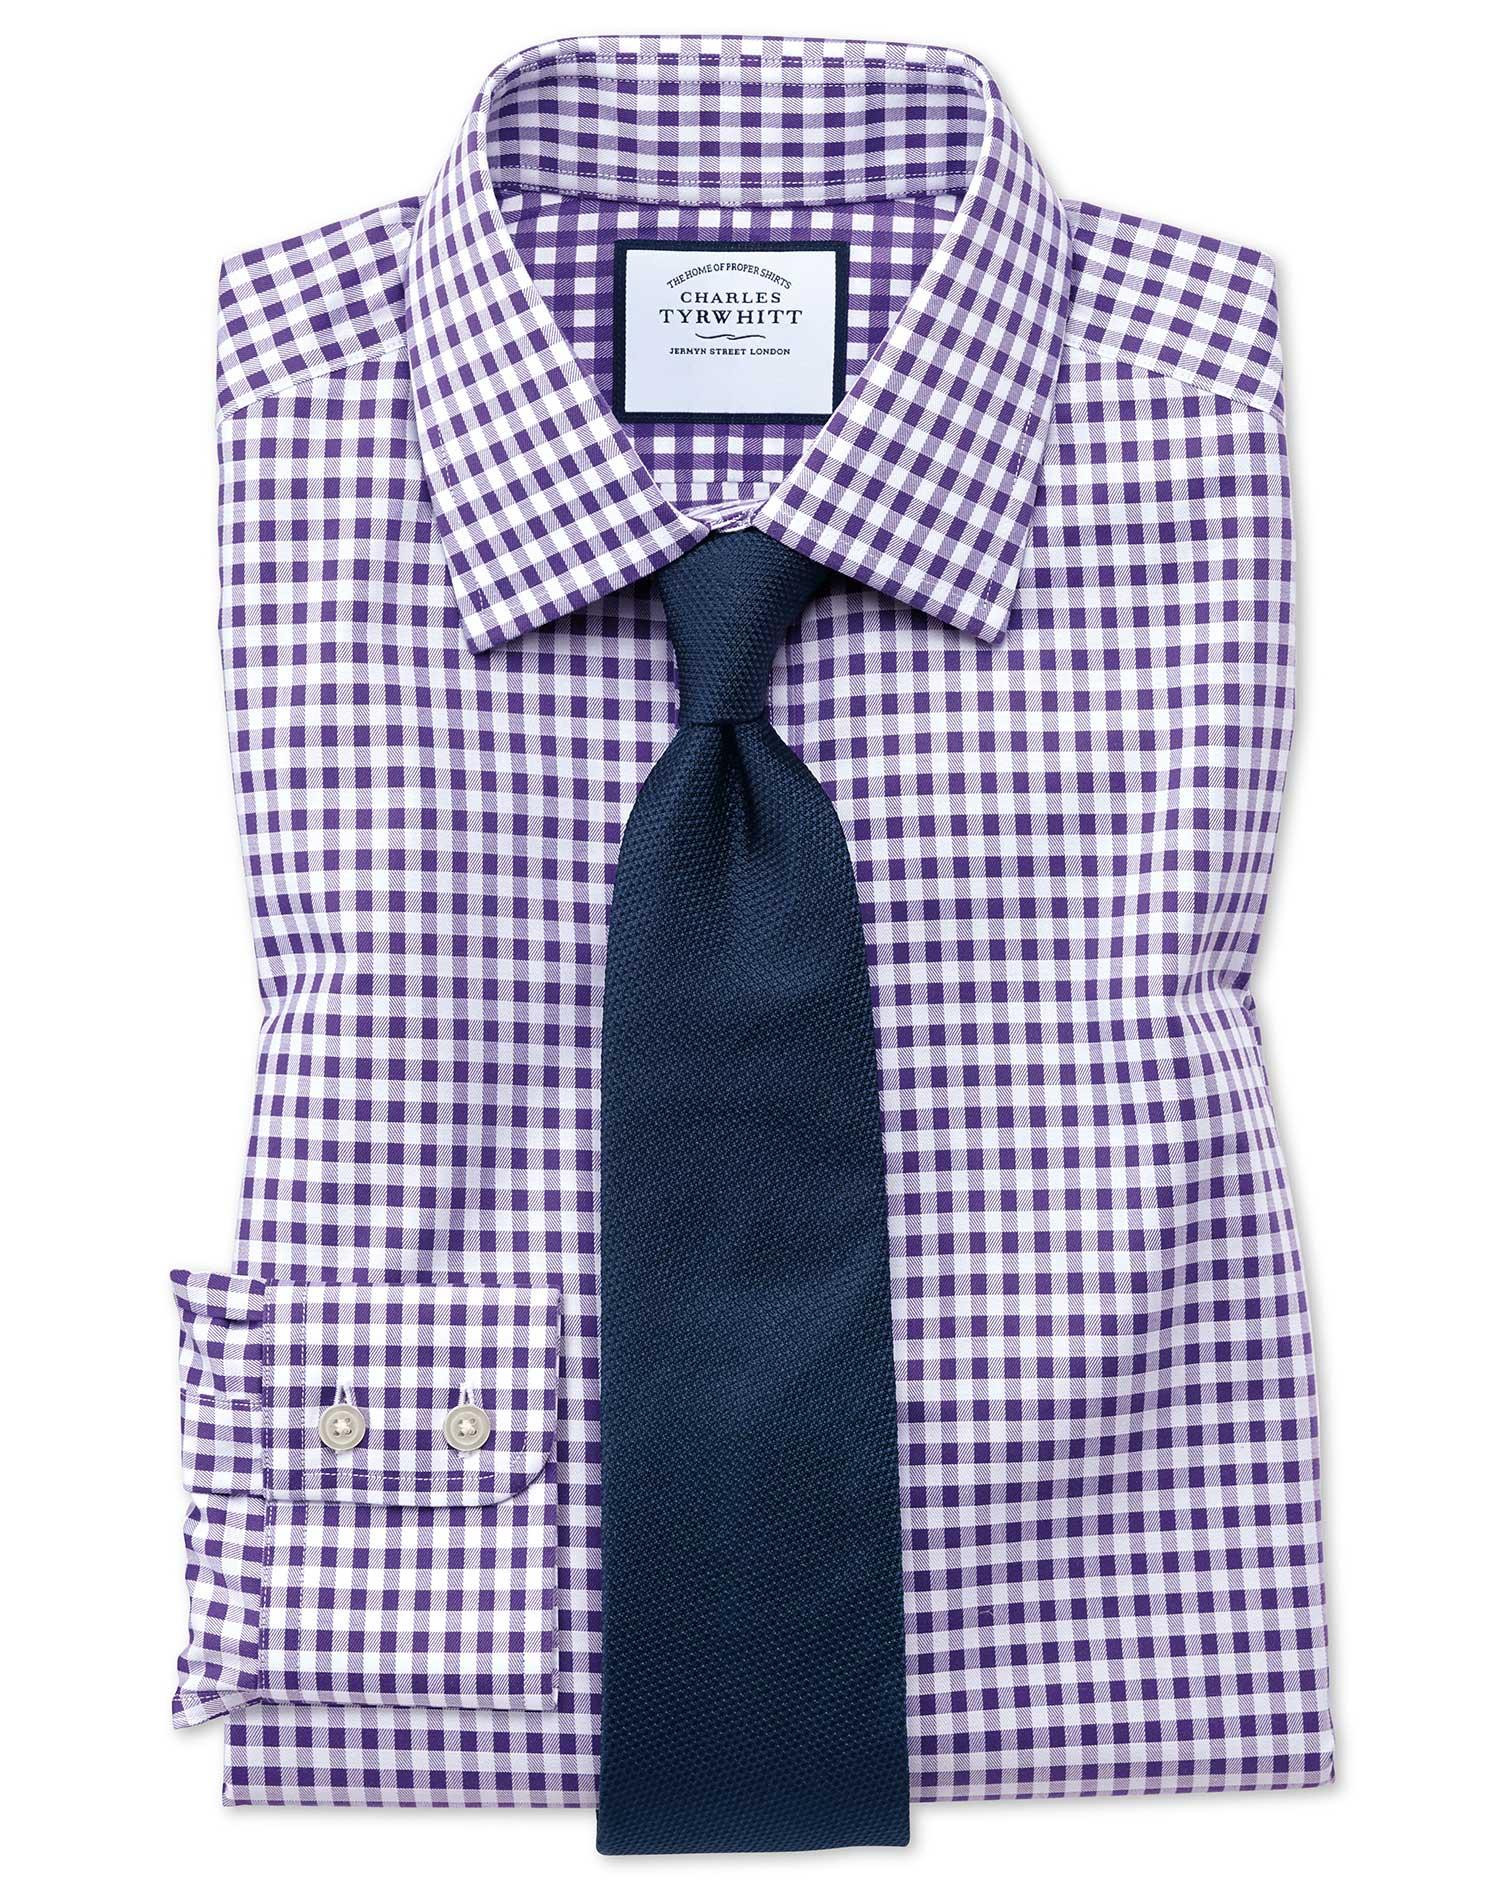 Slim Fit Non-Iron Gingham Purple Cotton Formal Shirt Single Cuff Size 16.5/33 by Charles Tyrwhitt